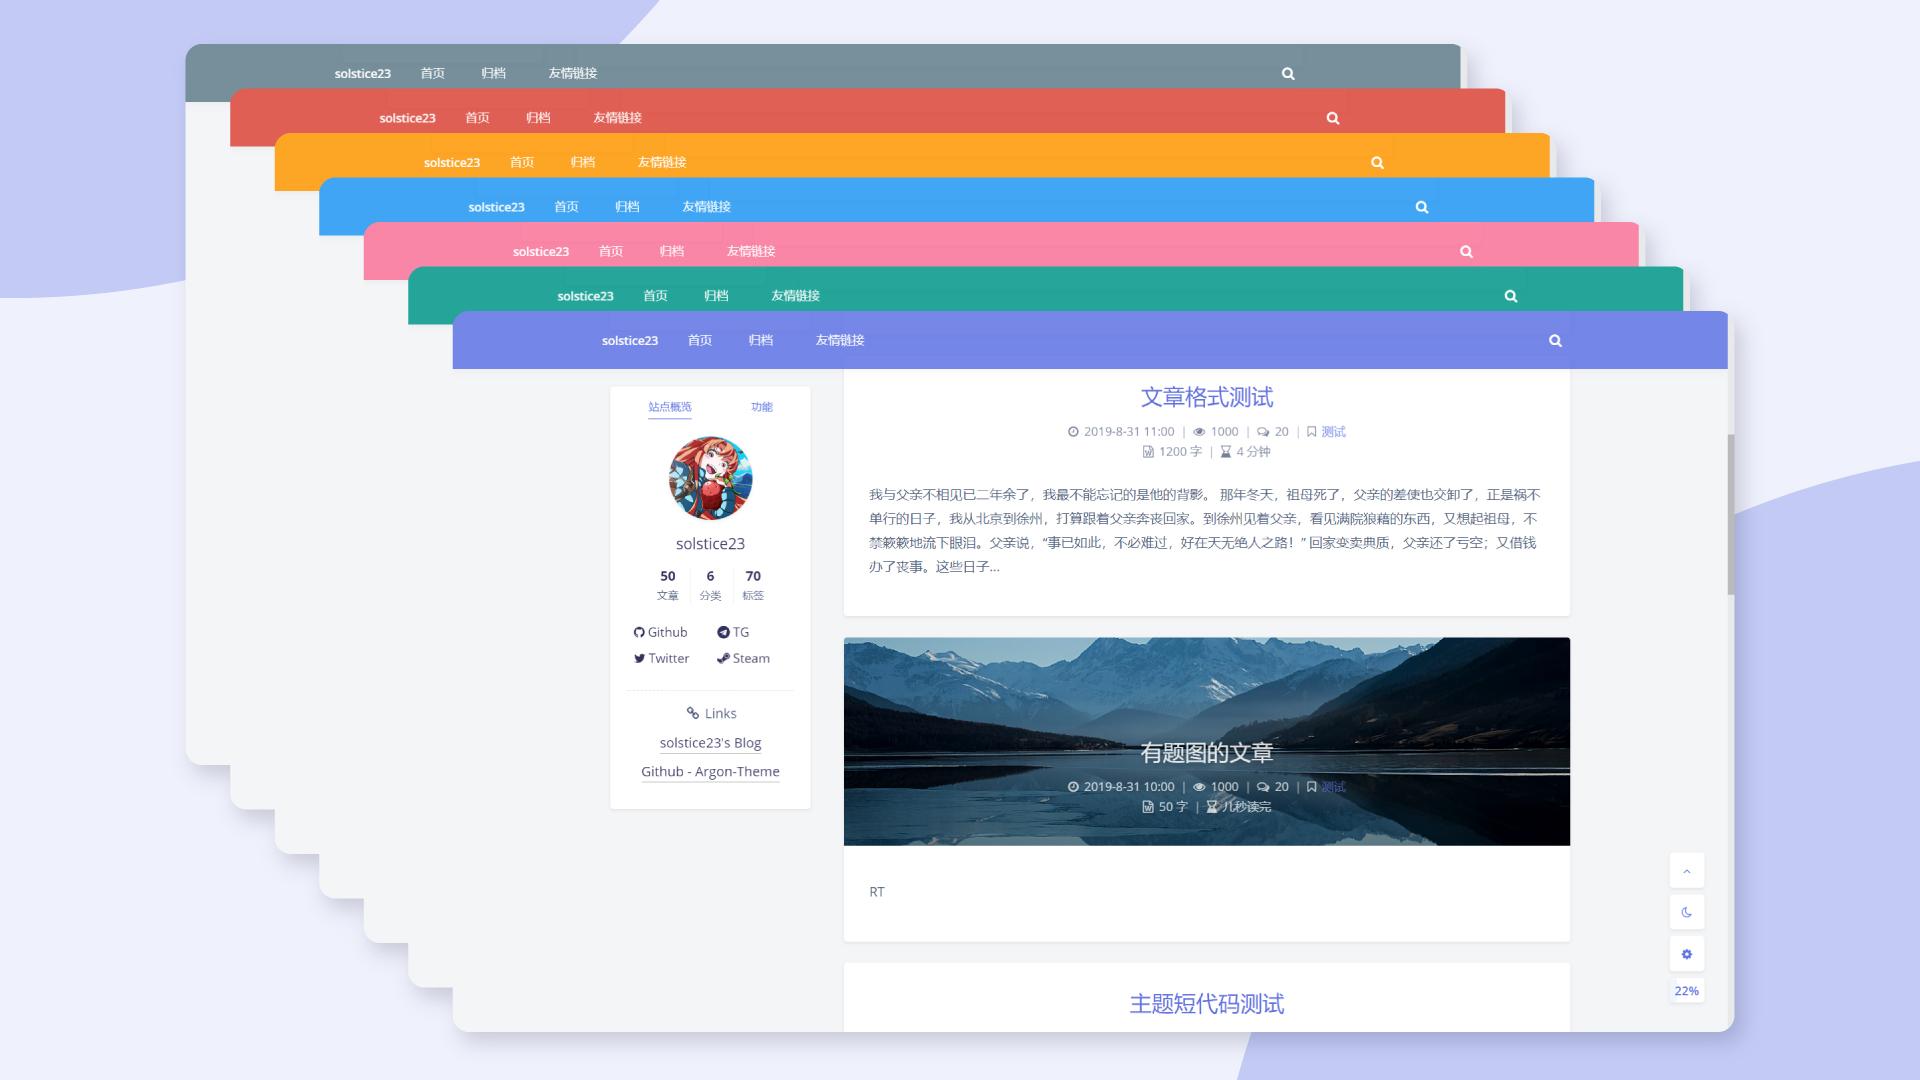 Argon-Theme 一个轻盈、简洁、美观的 WordPress 主题